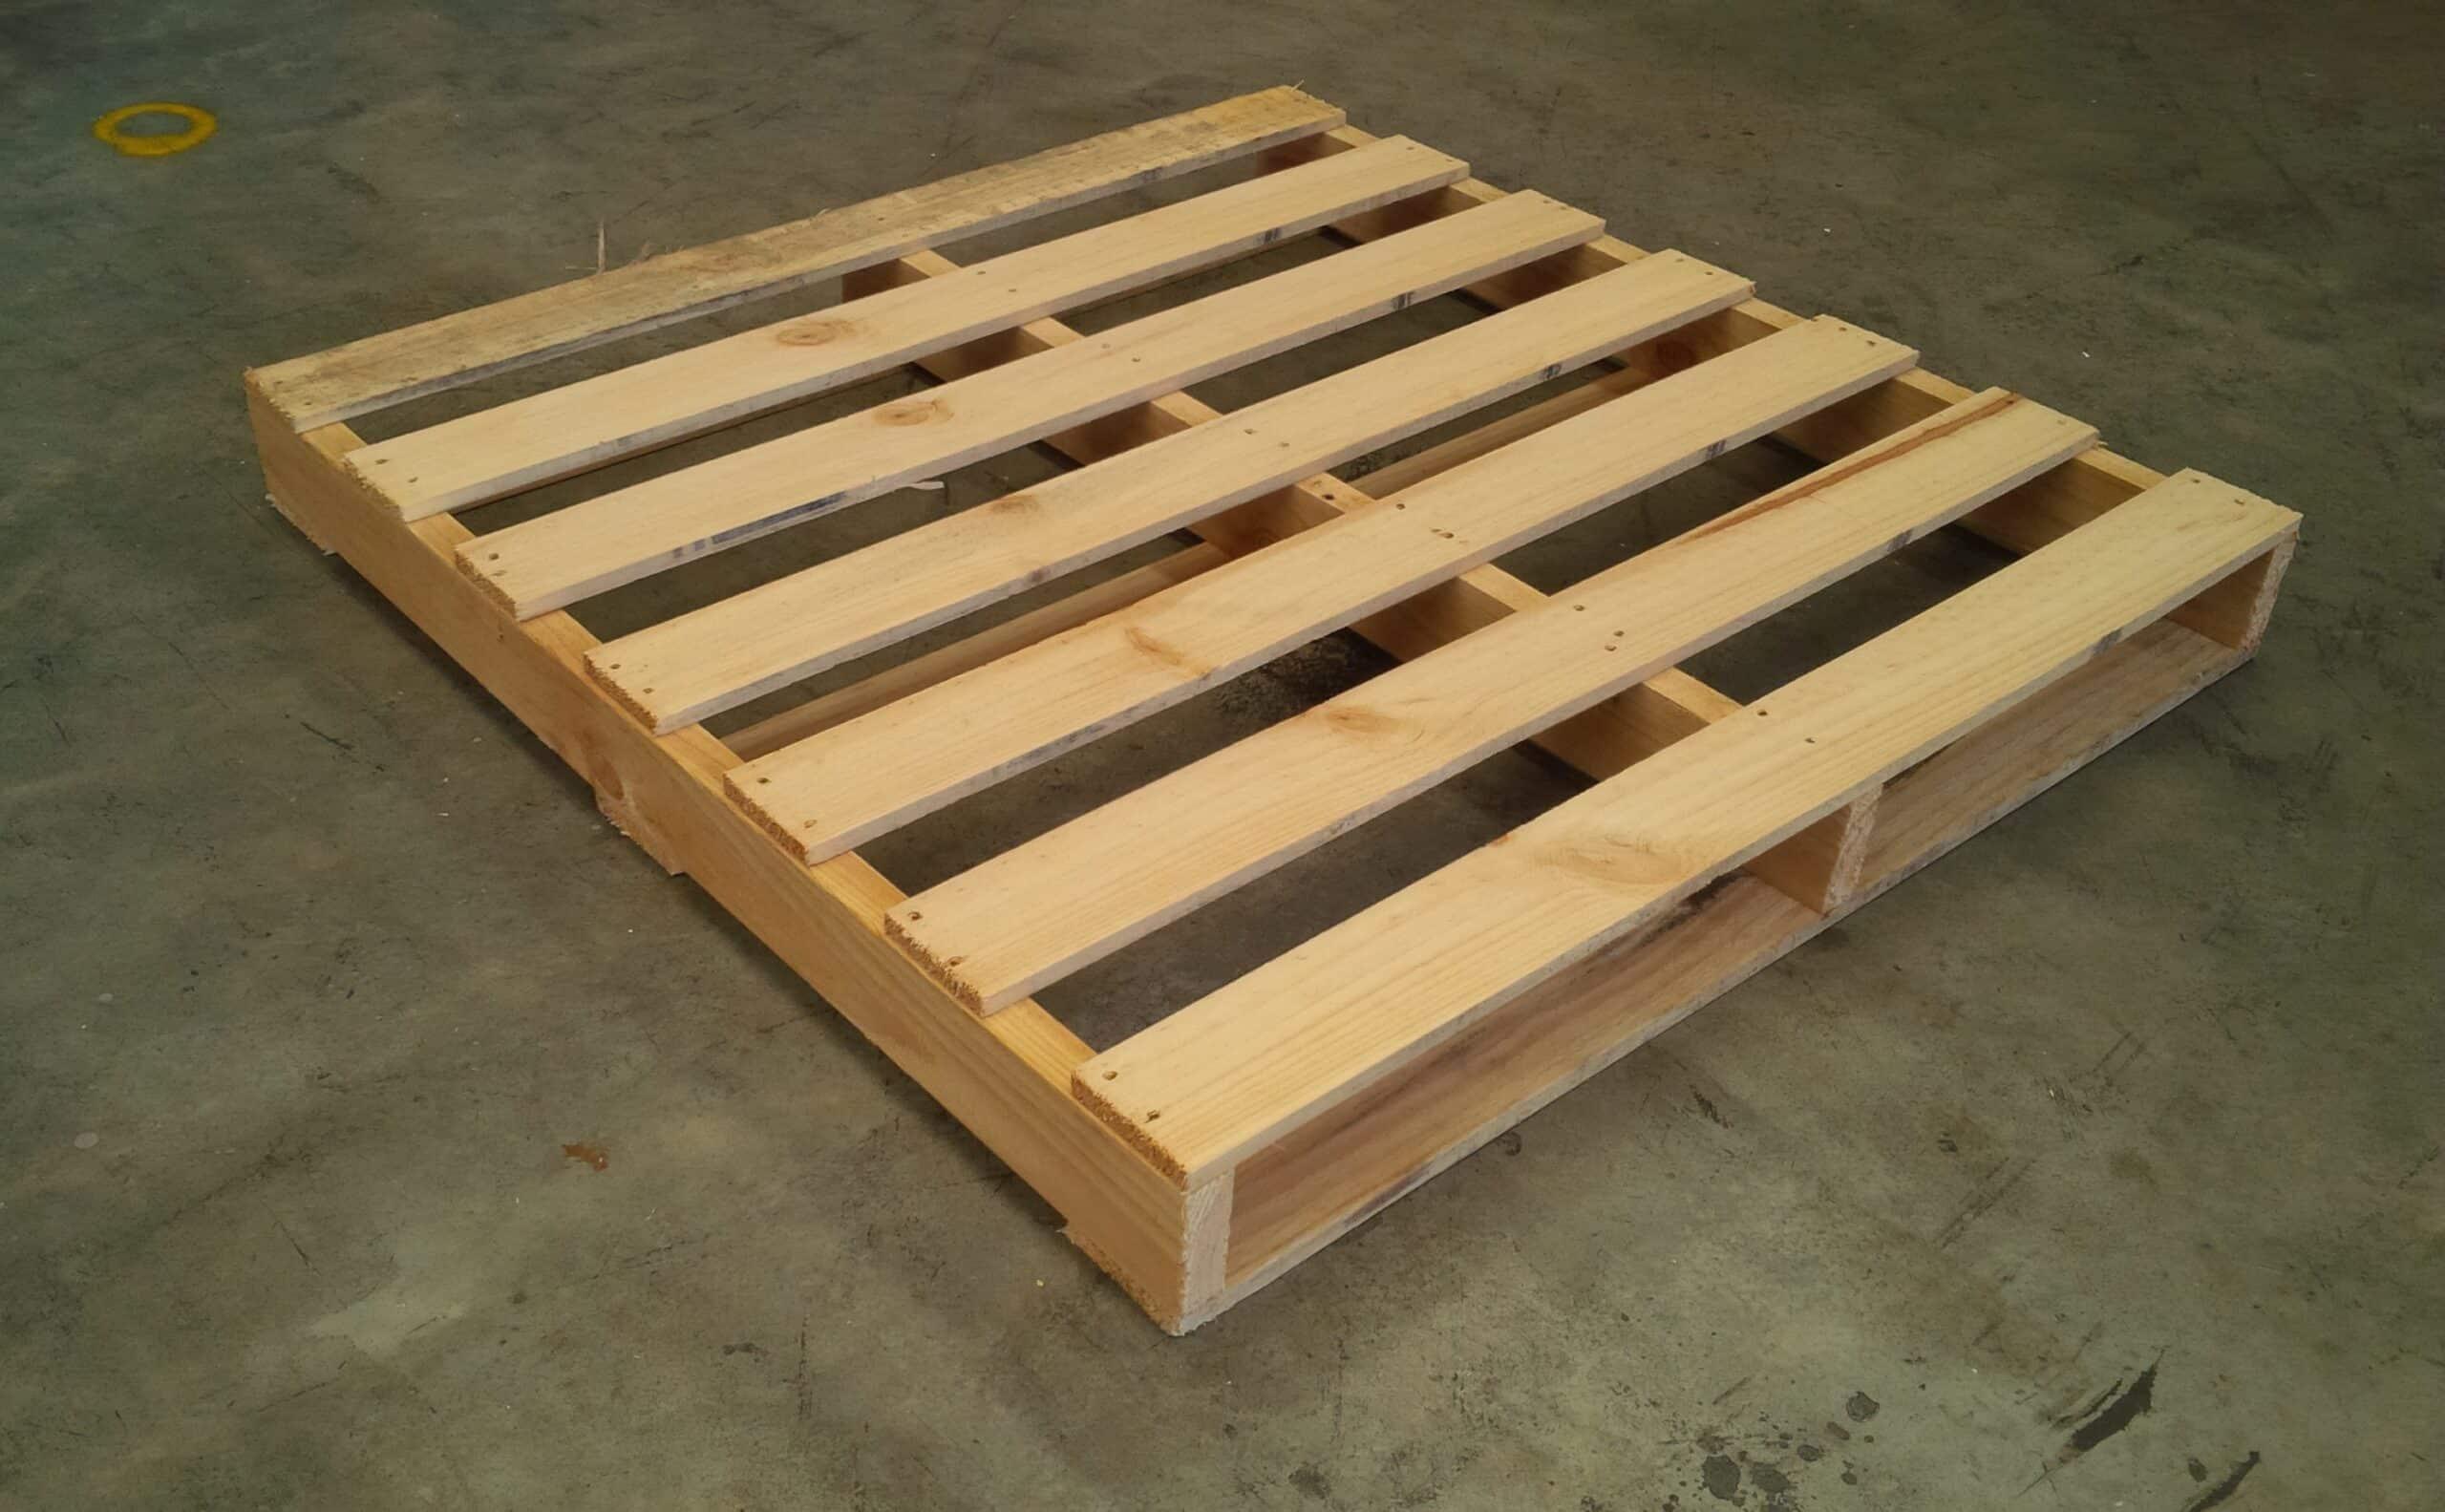 Standard 1 Tonne Pine Pallet 1165 x 1165